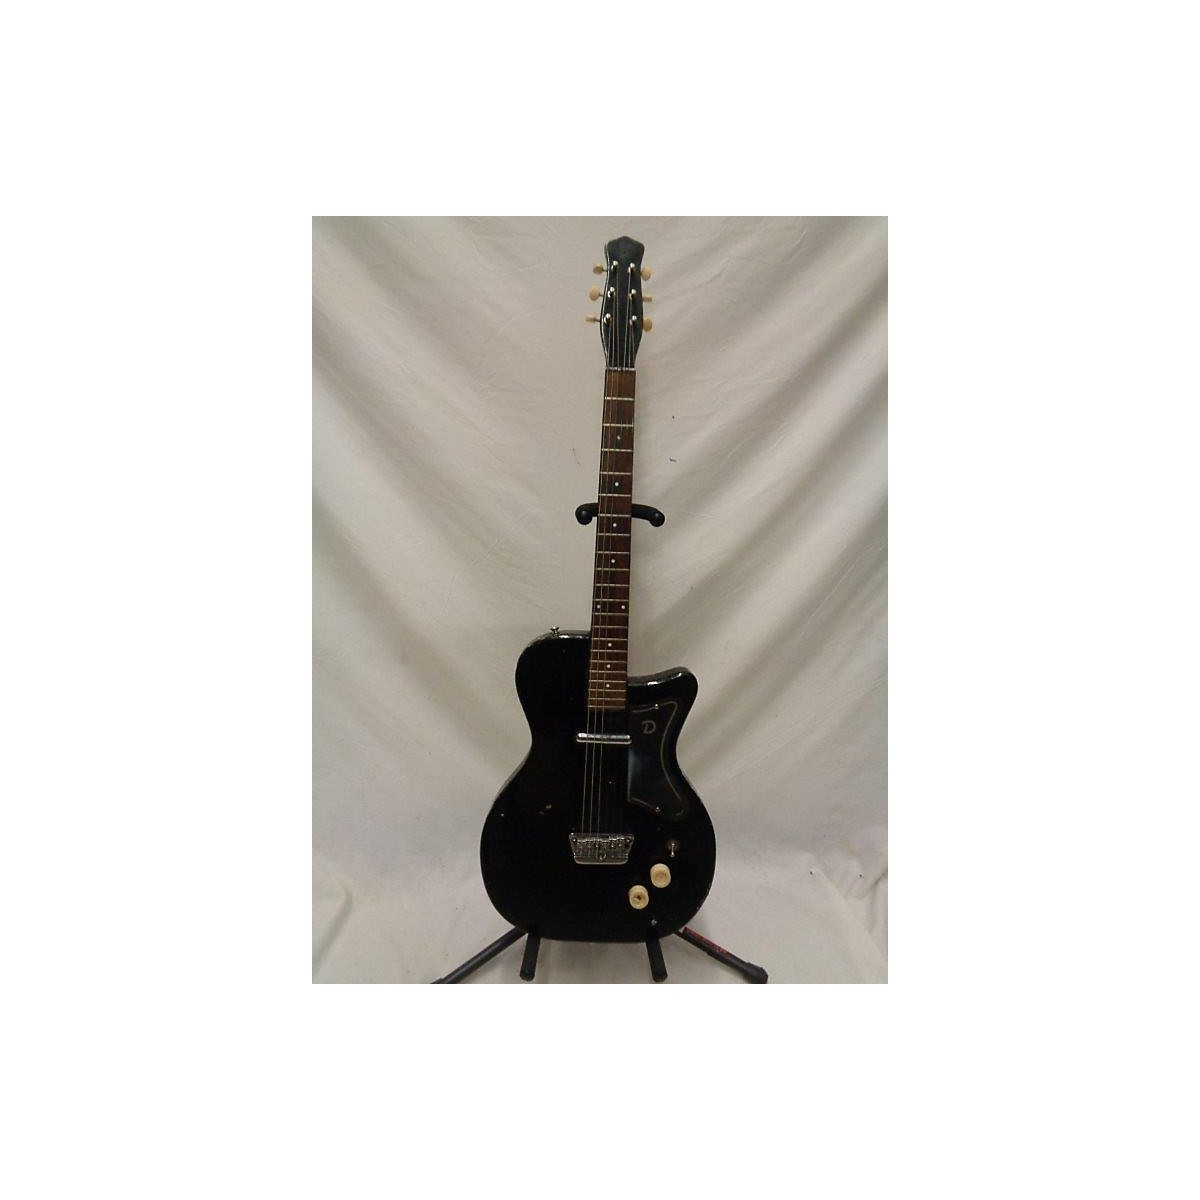 Danelectro 1957 U1 Solid Body Electric Guitar